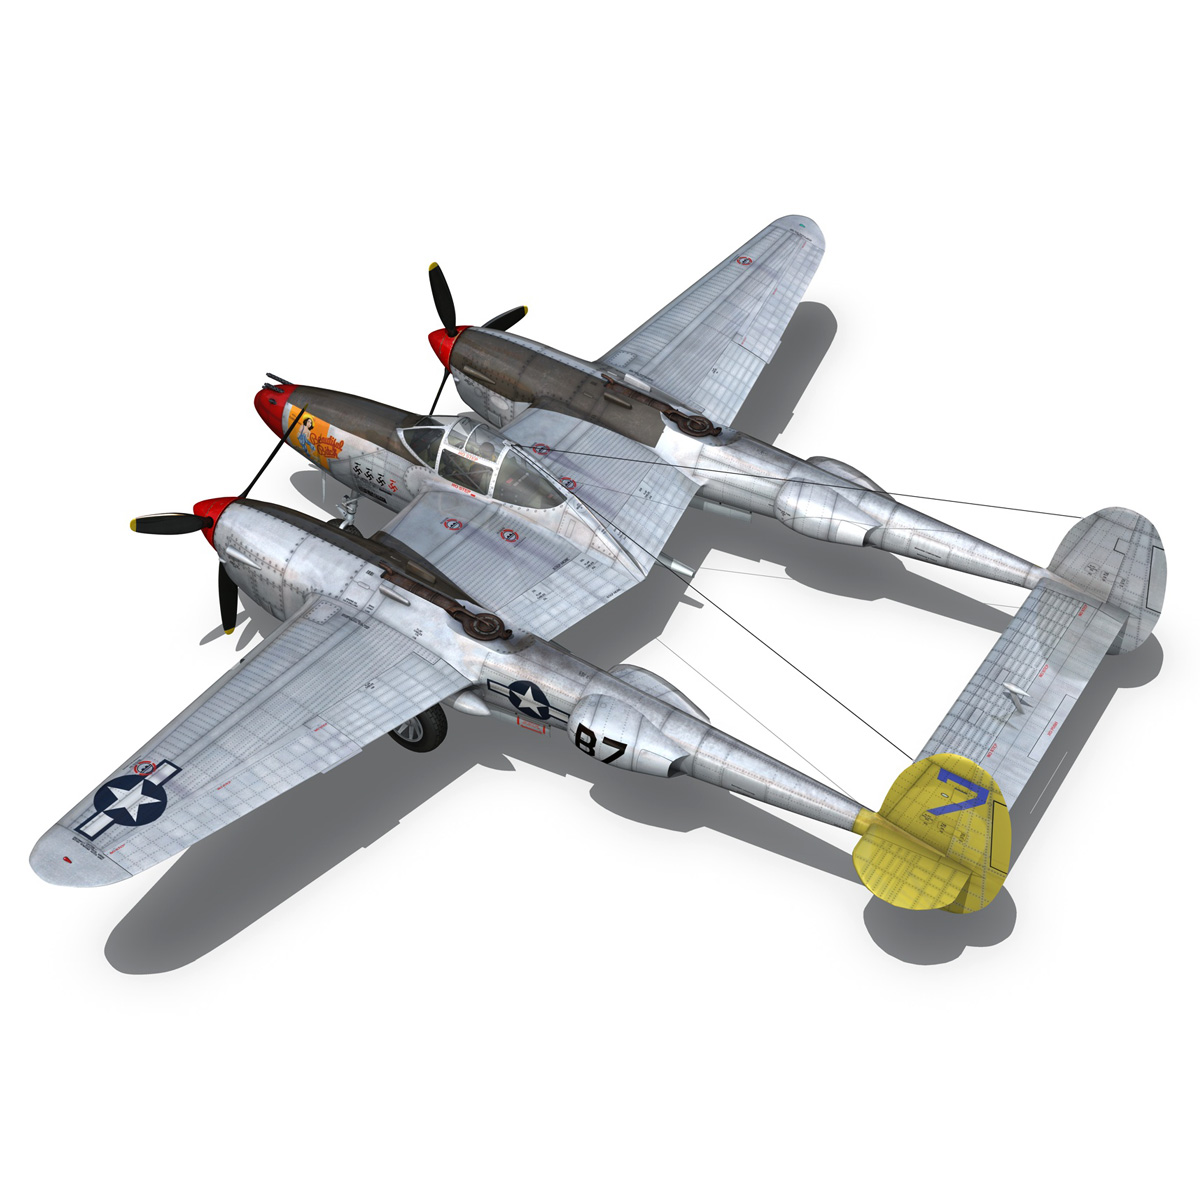 lockheed p-38 lightning – beautiful bitch 3d model fbx c4d lwo obj 272672